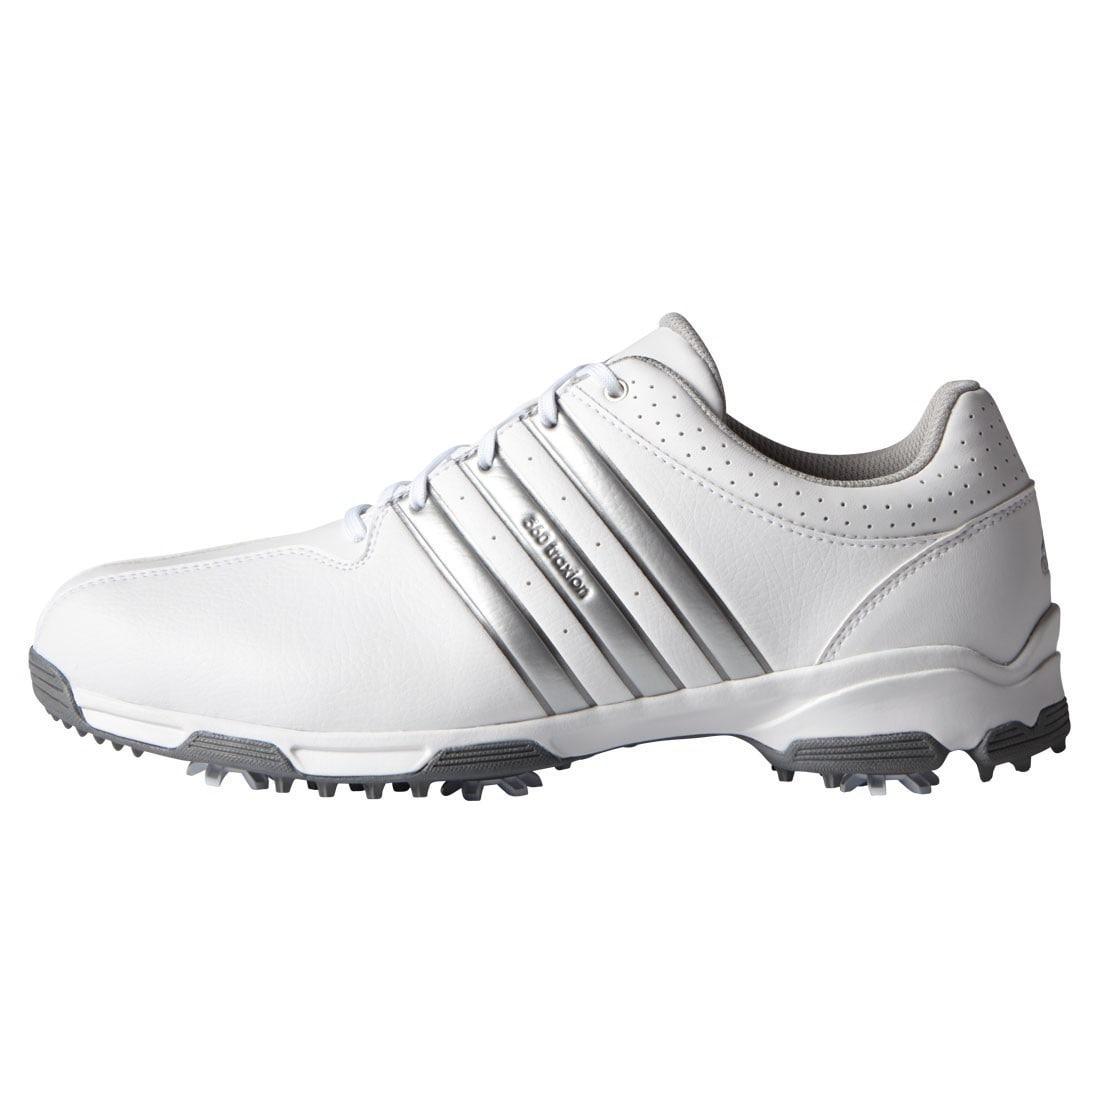 Adidas Men's 360 Traxion White/ Silver Metallic Golf Shoe...